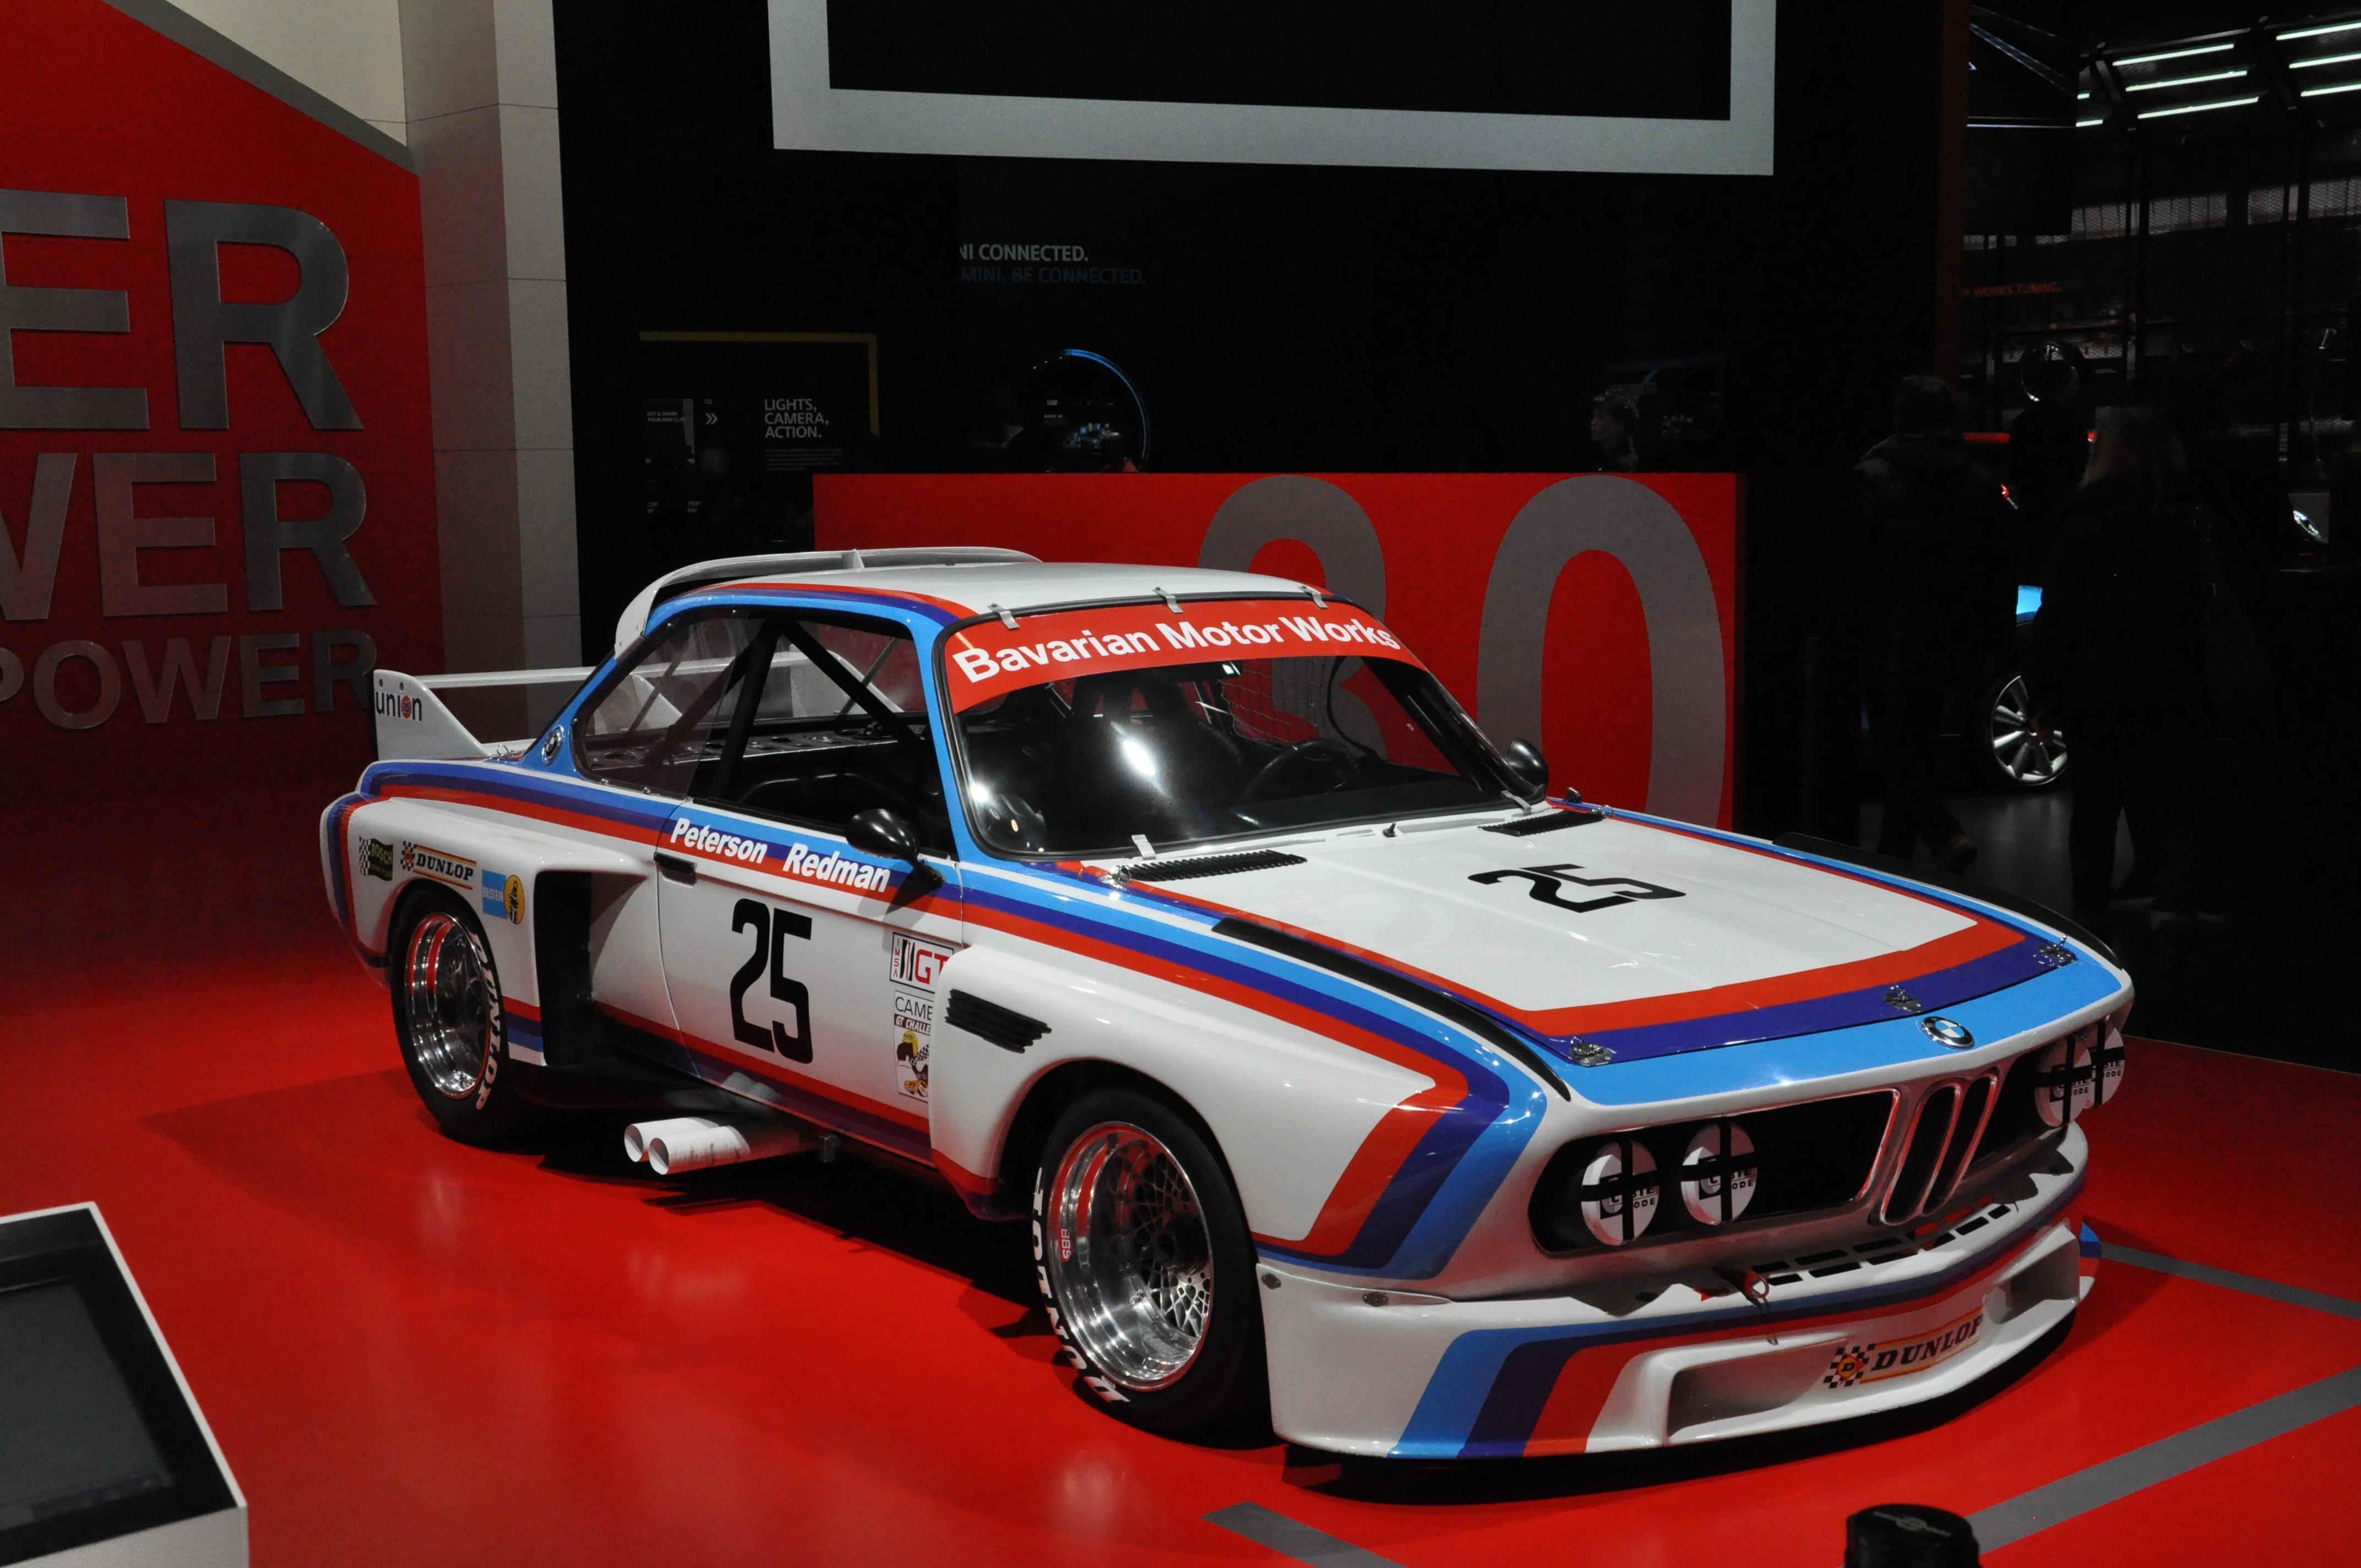 BMW Motorsport: January 2015 News Roundup - BimmerFile